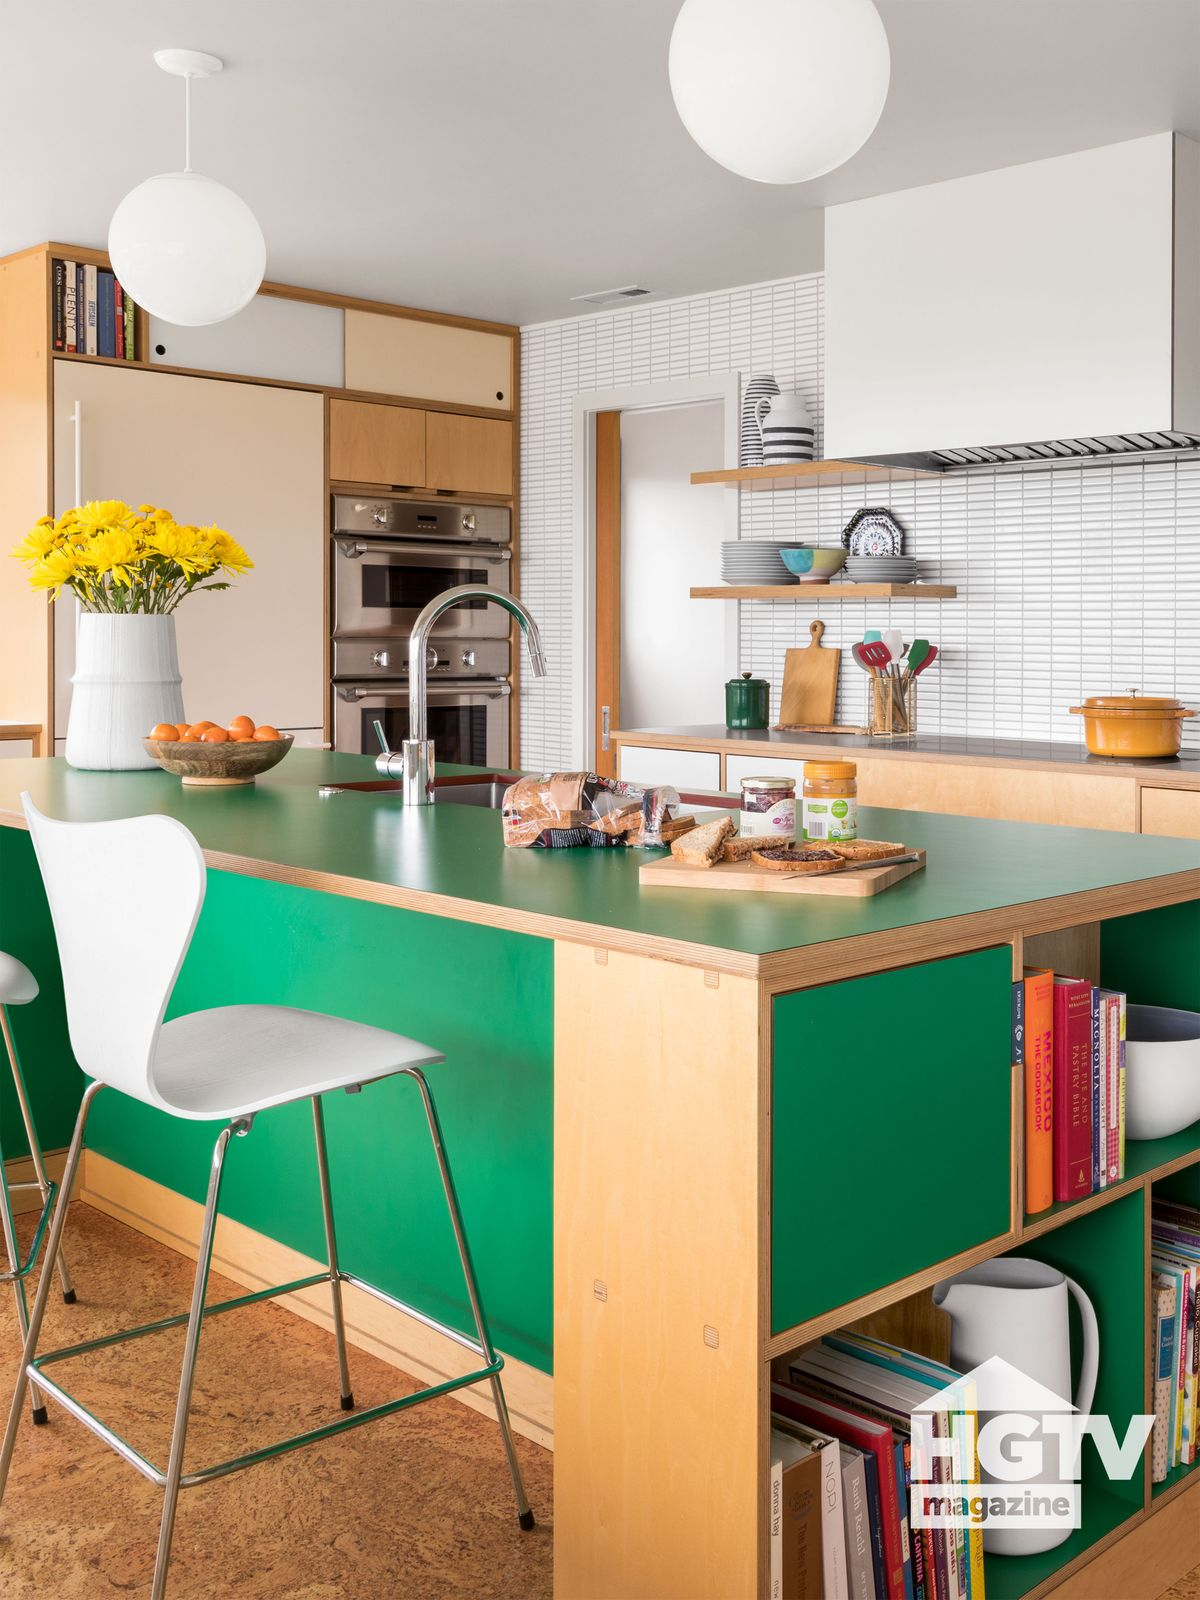 A 1960s style kitchen from HGTV Magazine